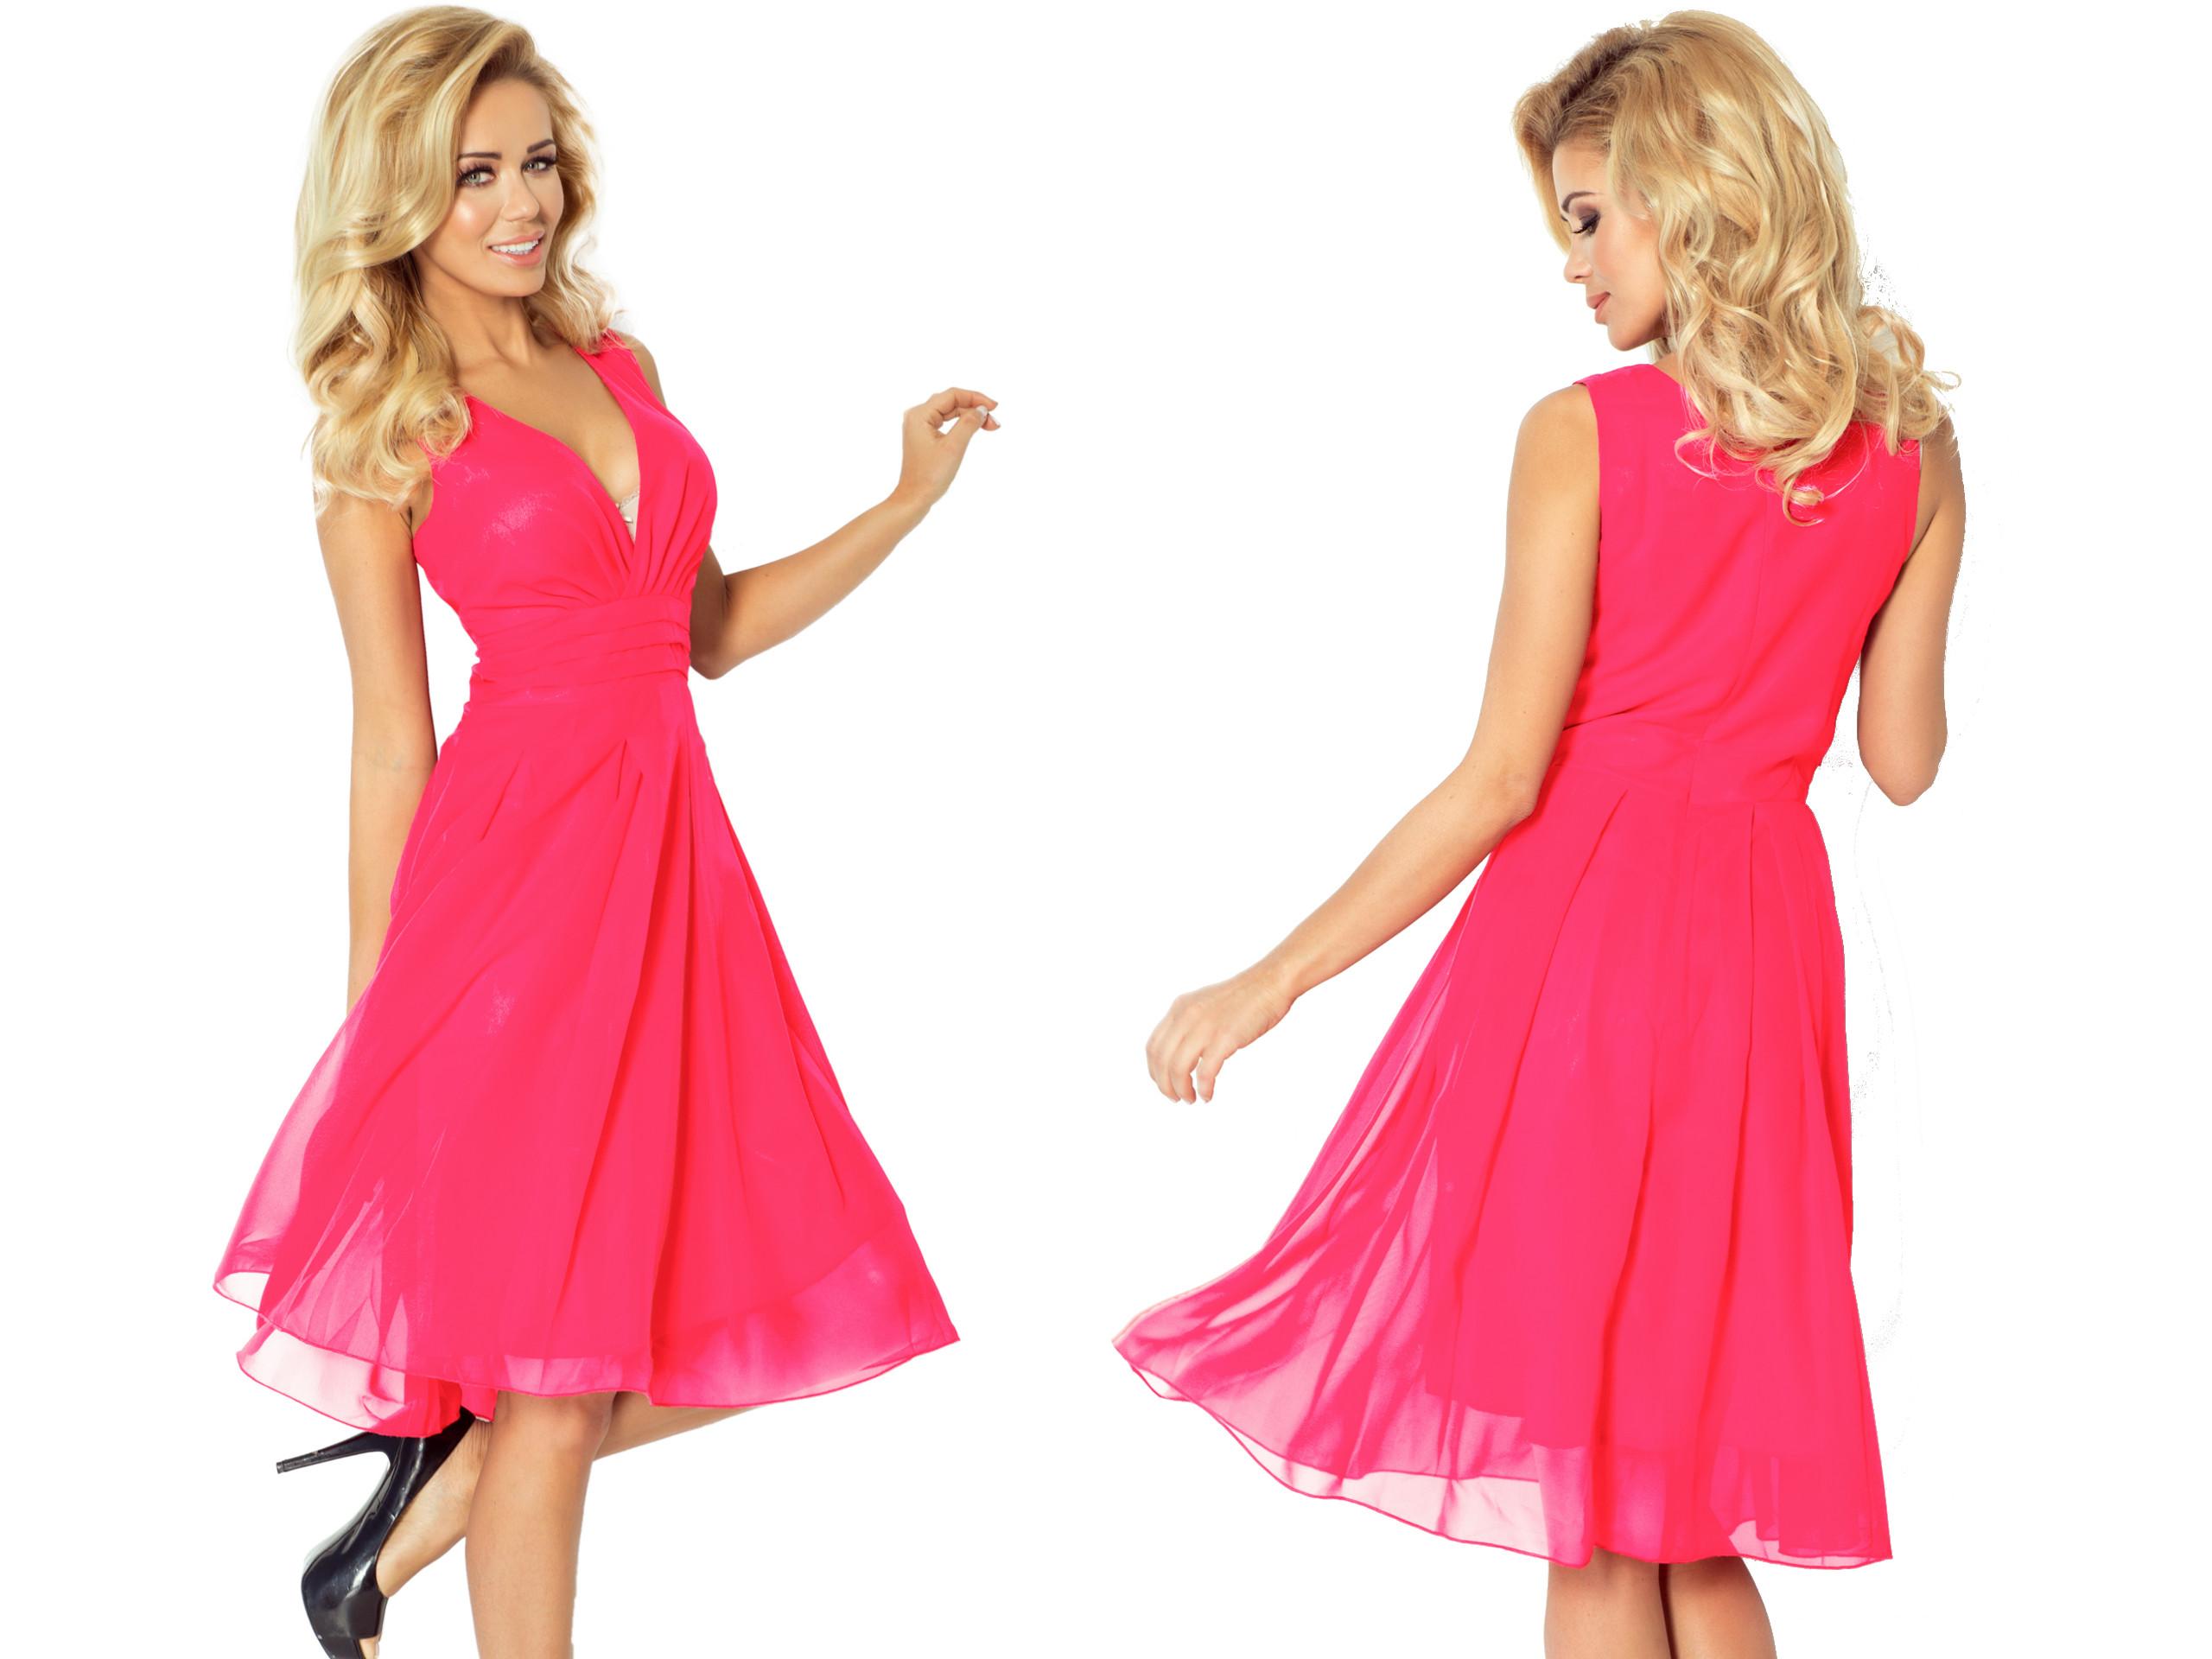 05285ff655 Modna Młodzieżowa Sukienka KOKTAJLOWA 35-10 XL 42 ...